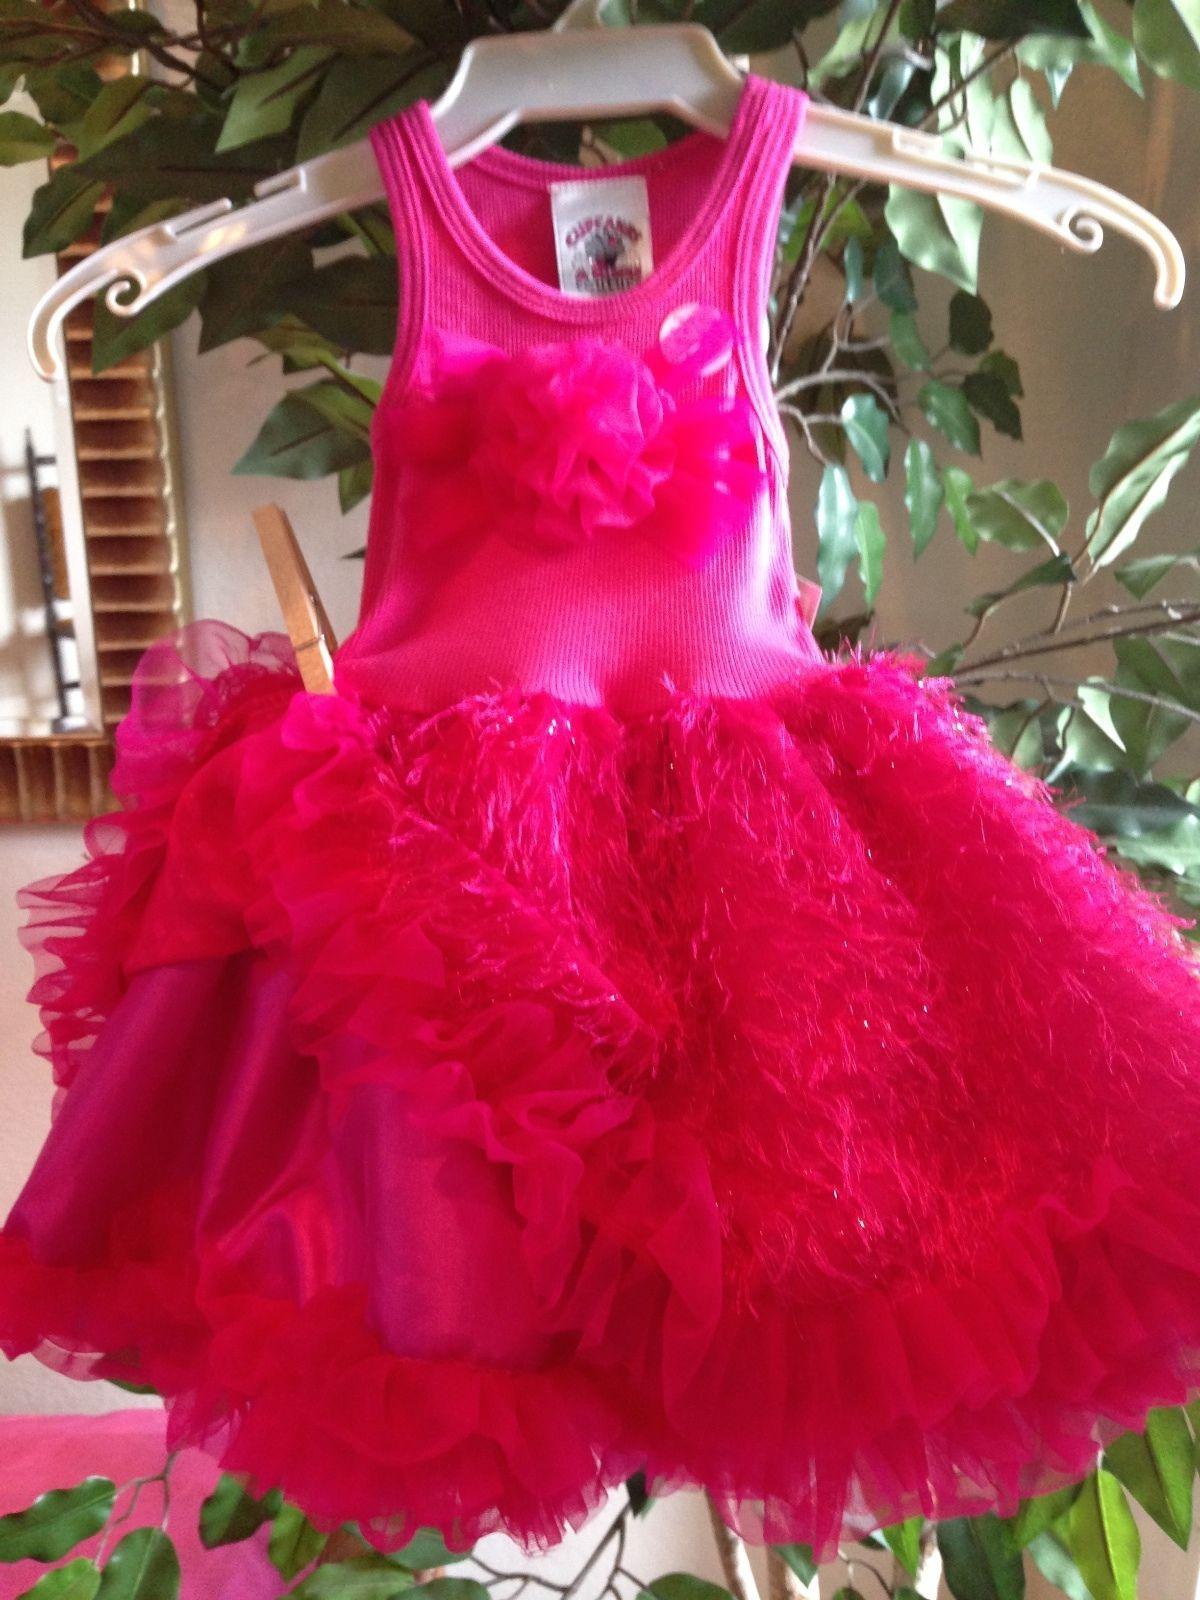 Image 3 of Posh Sparkly Fuchsia Eyelash Chiffon Pink Tutu Dress, 6M-5/6 USA Cupcakes Kisses